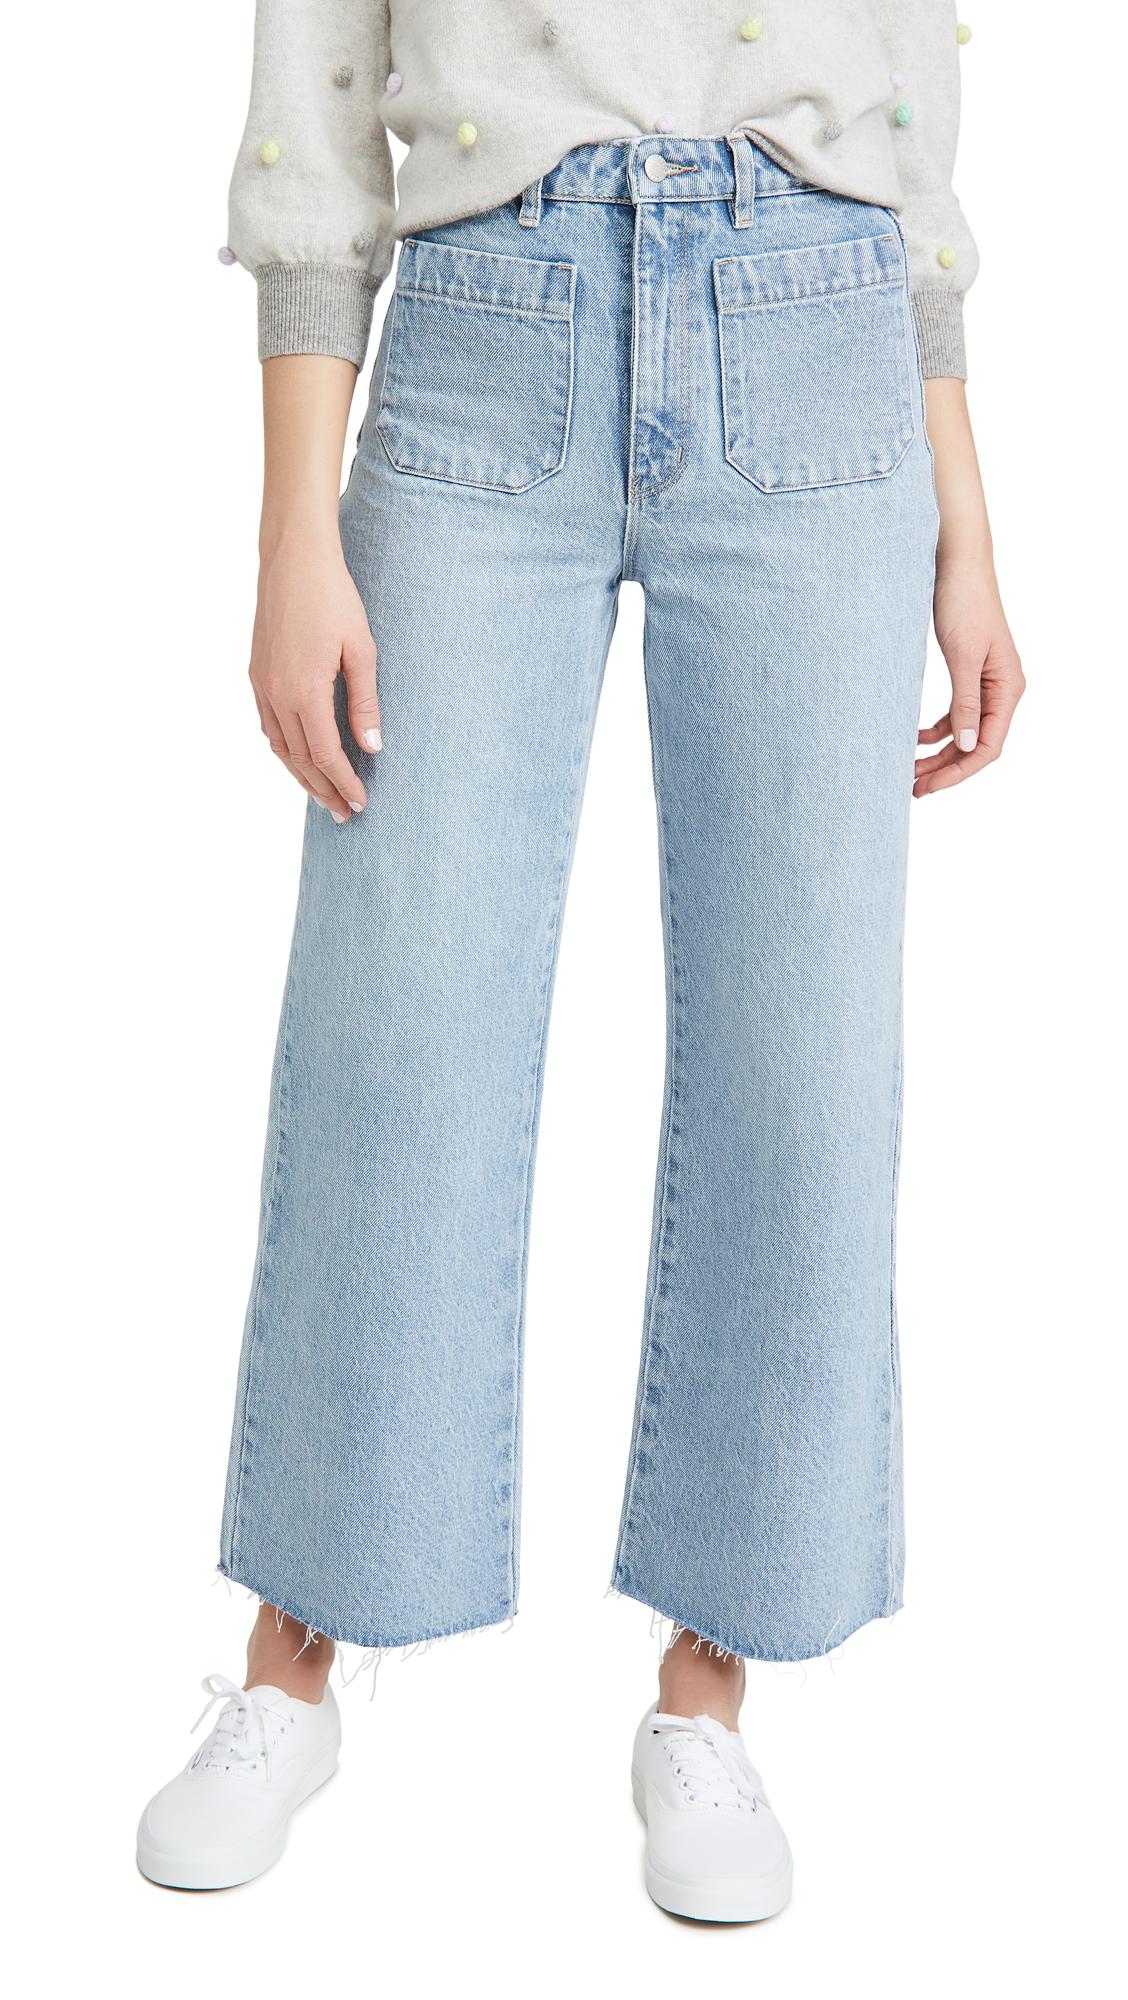 Rolla's Sailor Jeans